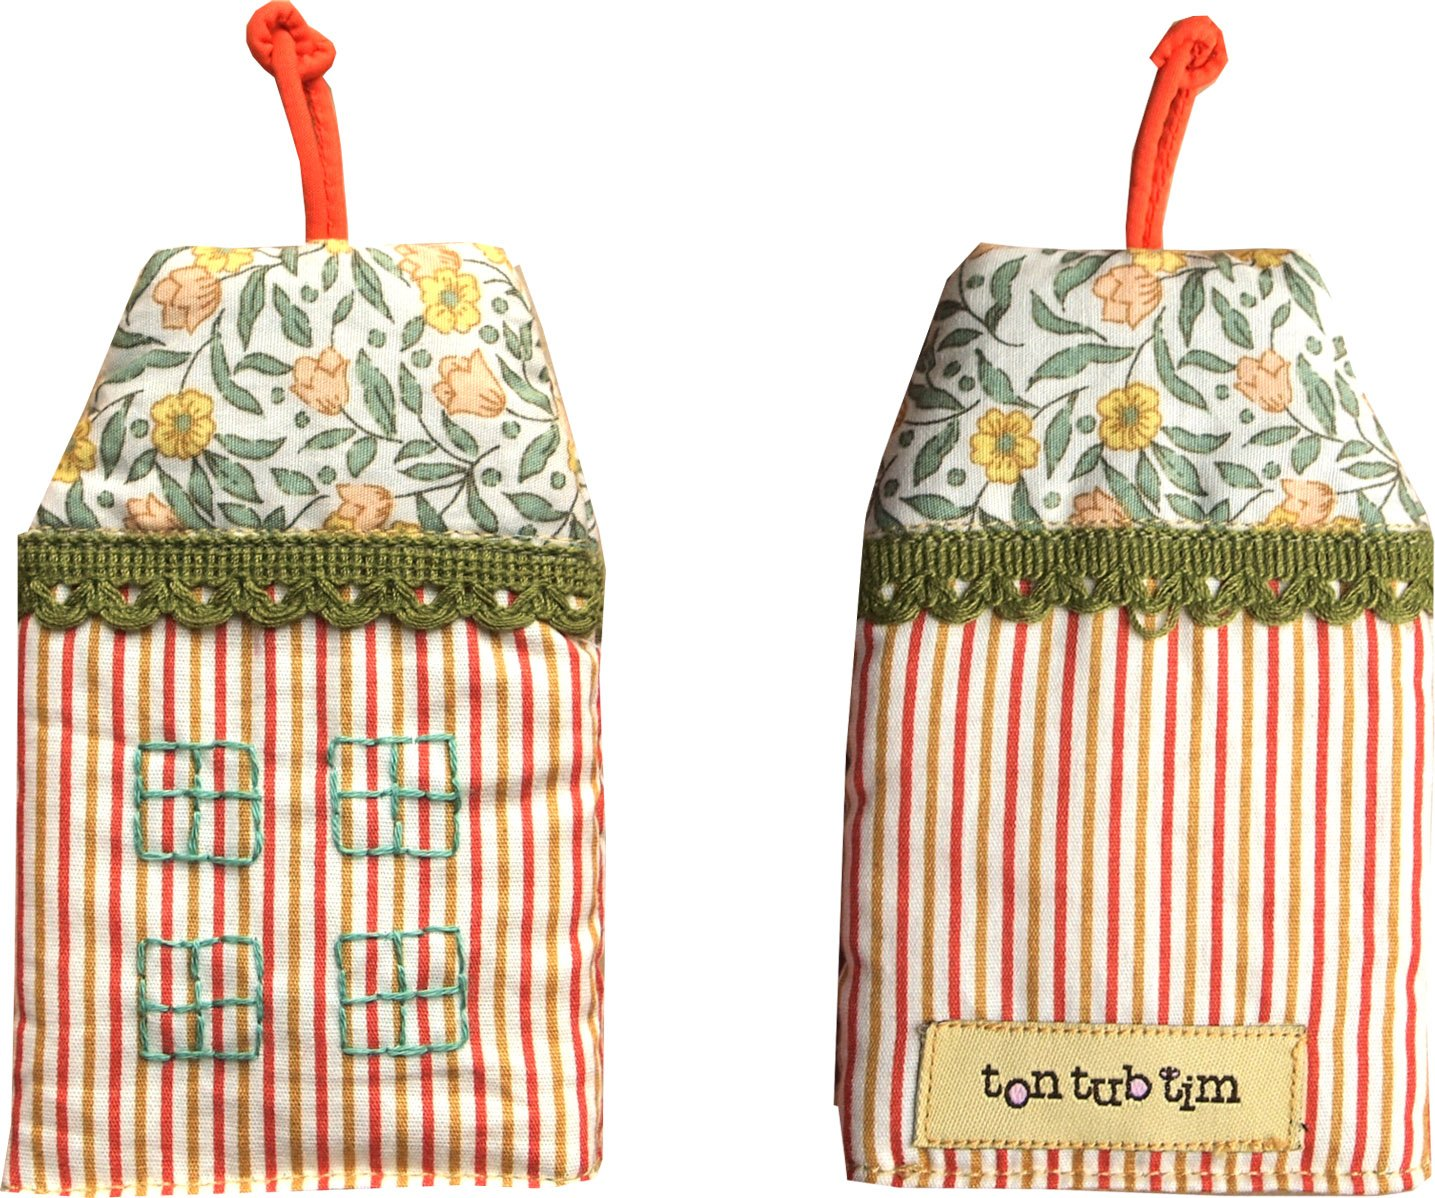 TonTubTim Home Sweet Home Key Holder / Key Fob (size s): Pin Stripe Orange